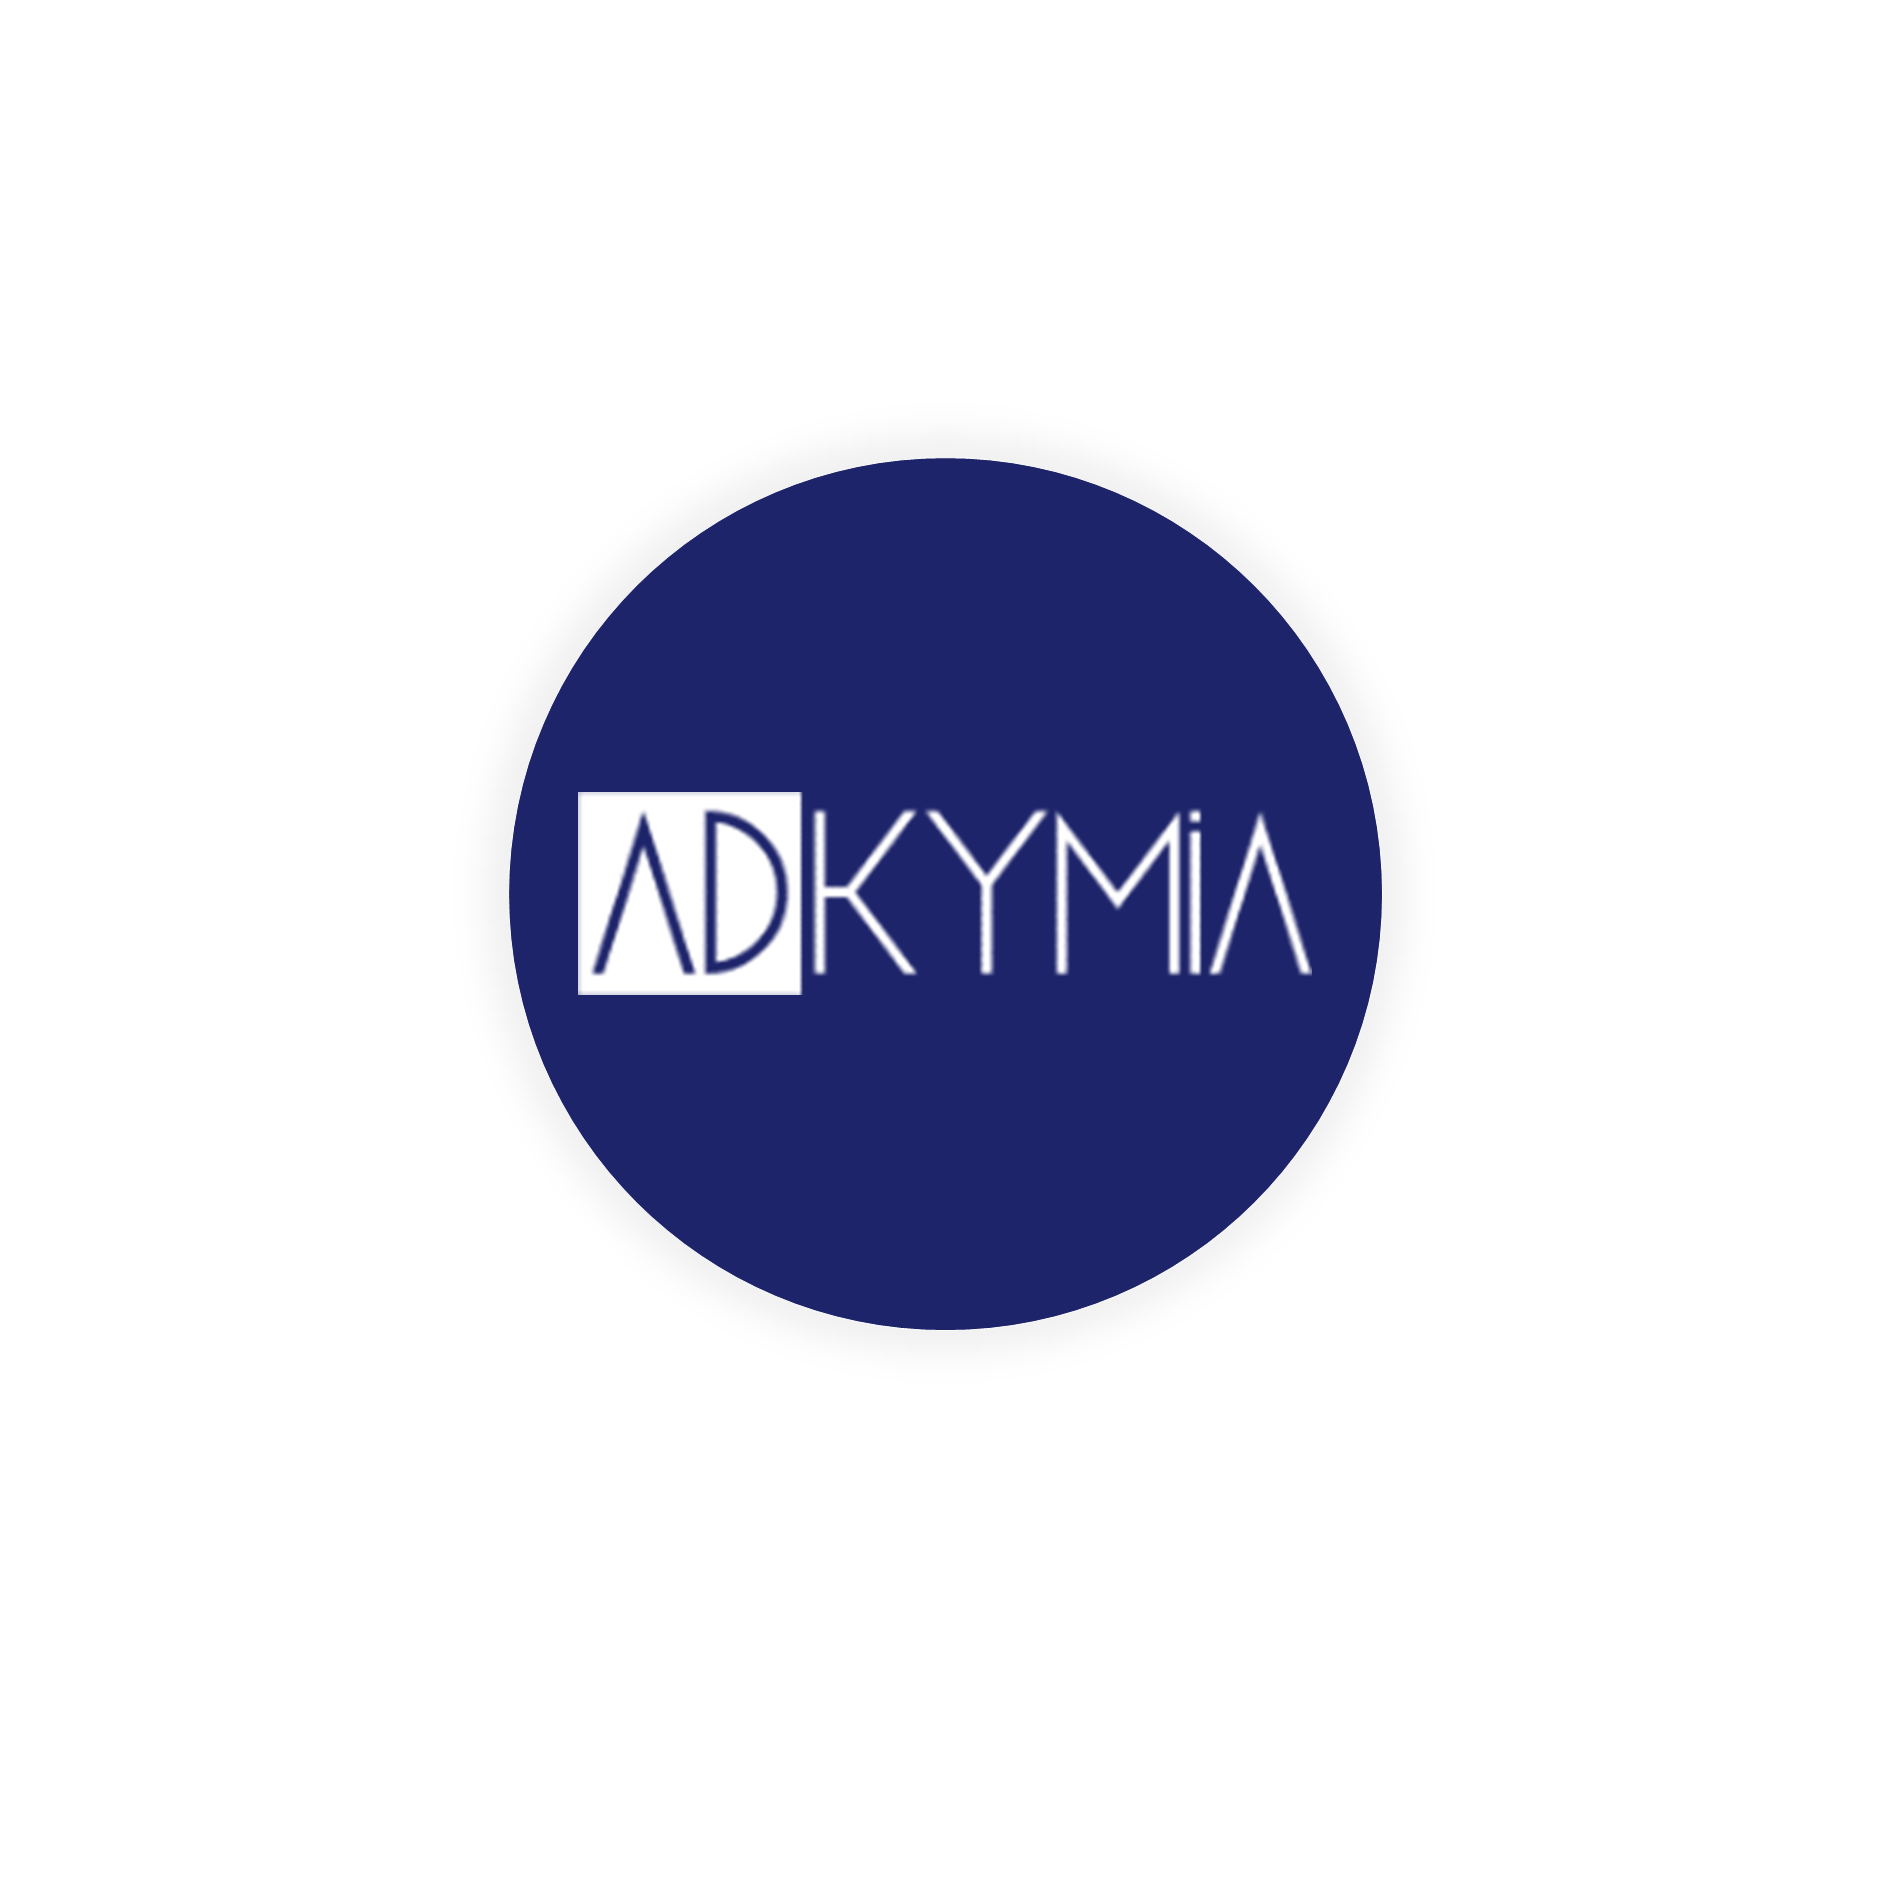 notoriété de marque - adkymia